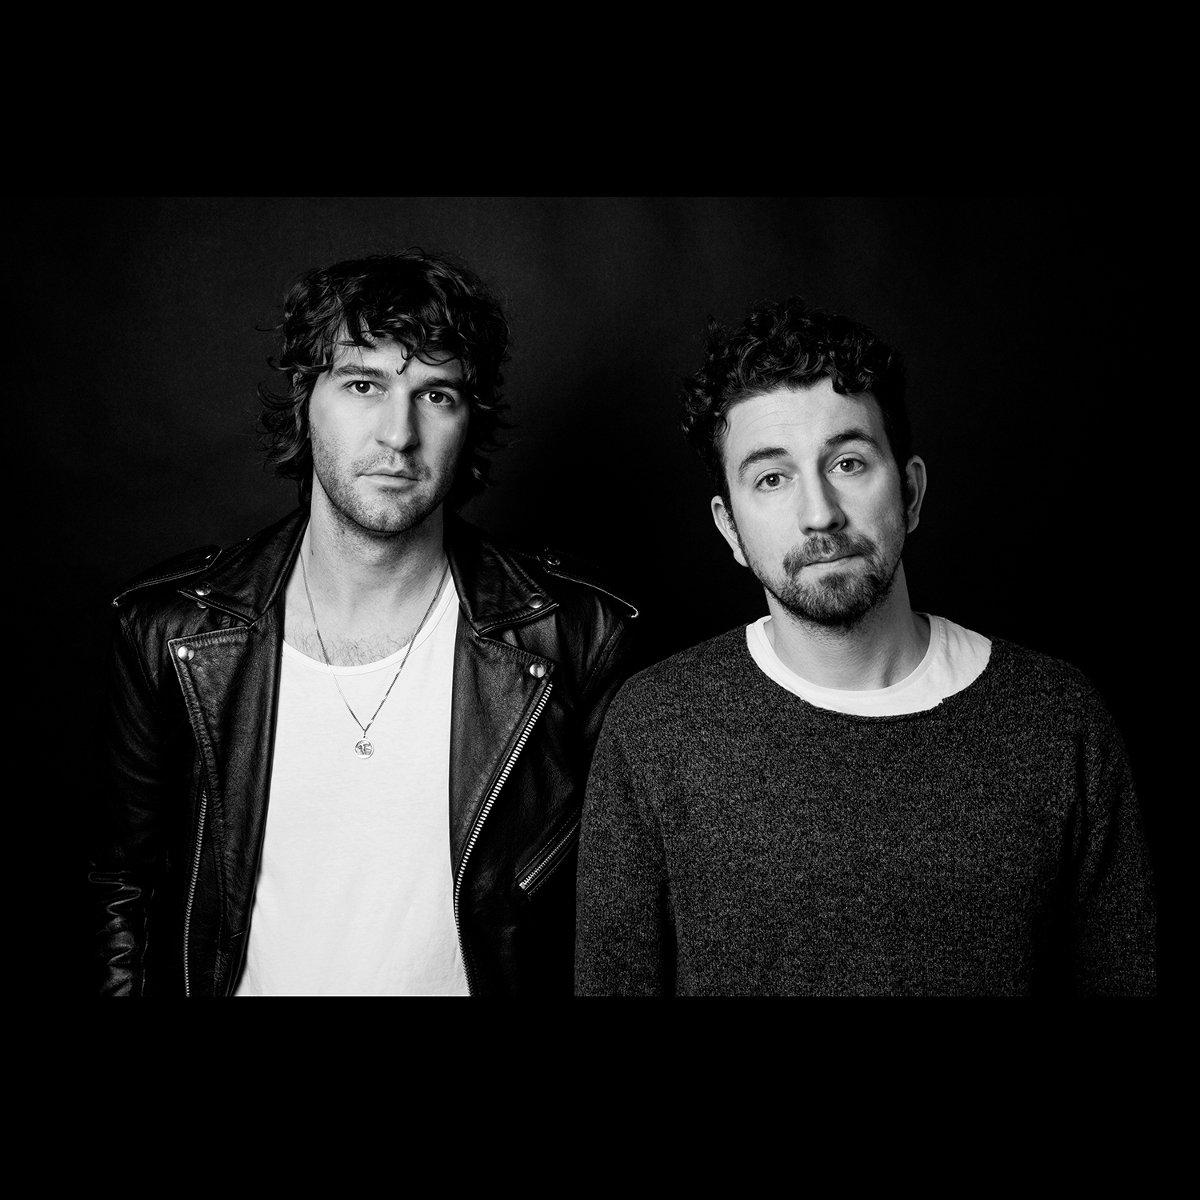 free download mp3 michael learns to rock full album rar